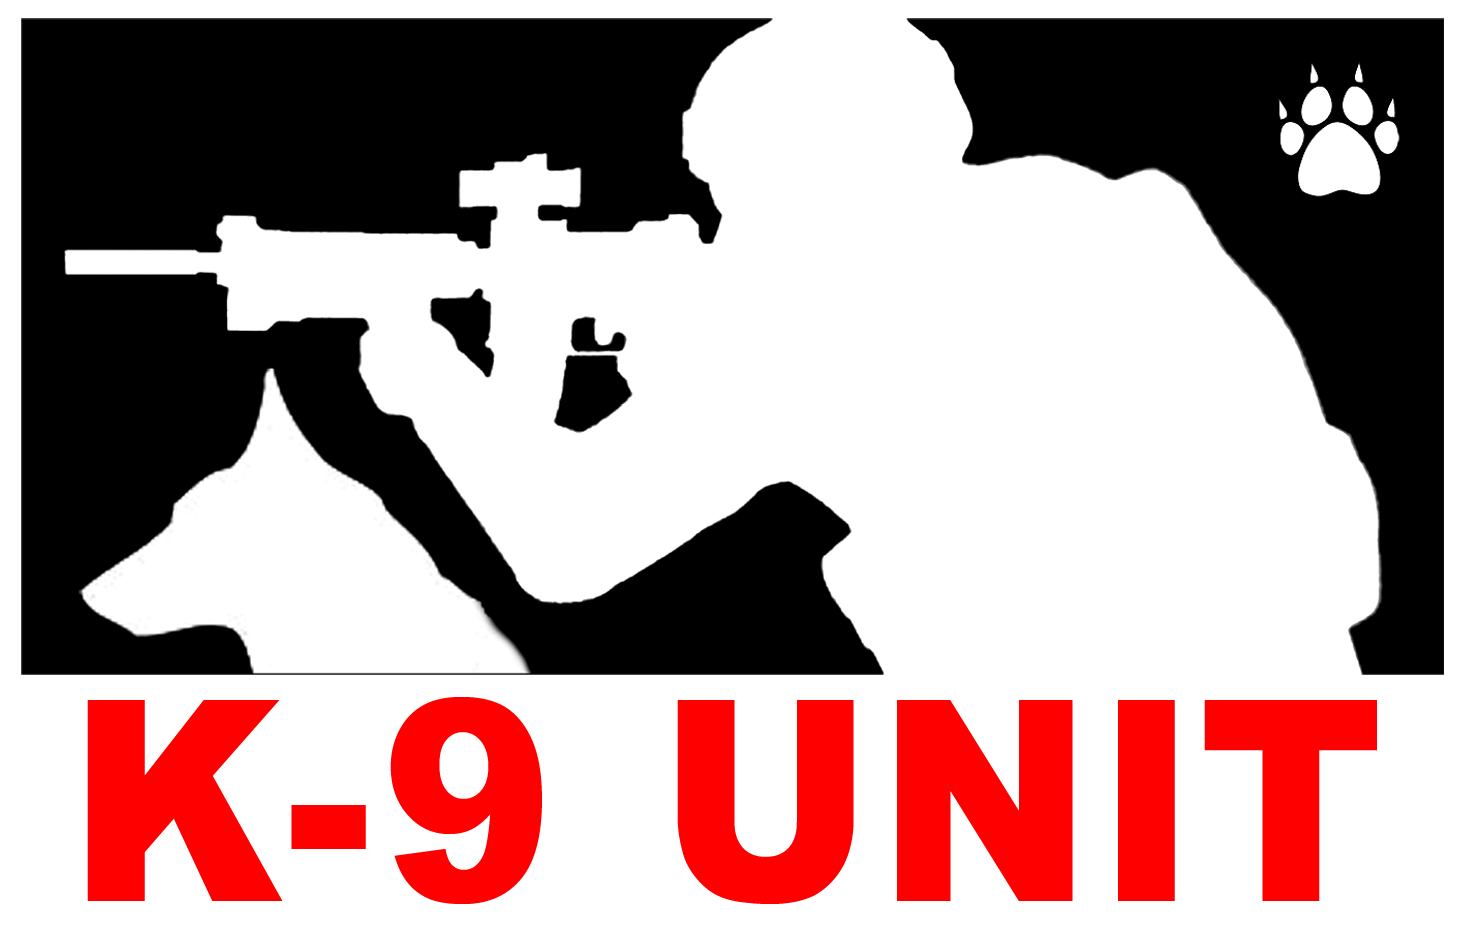 K9 dog clipart image royalty free K9 Unit - Major League image royalty free